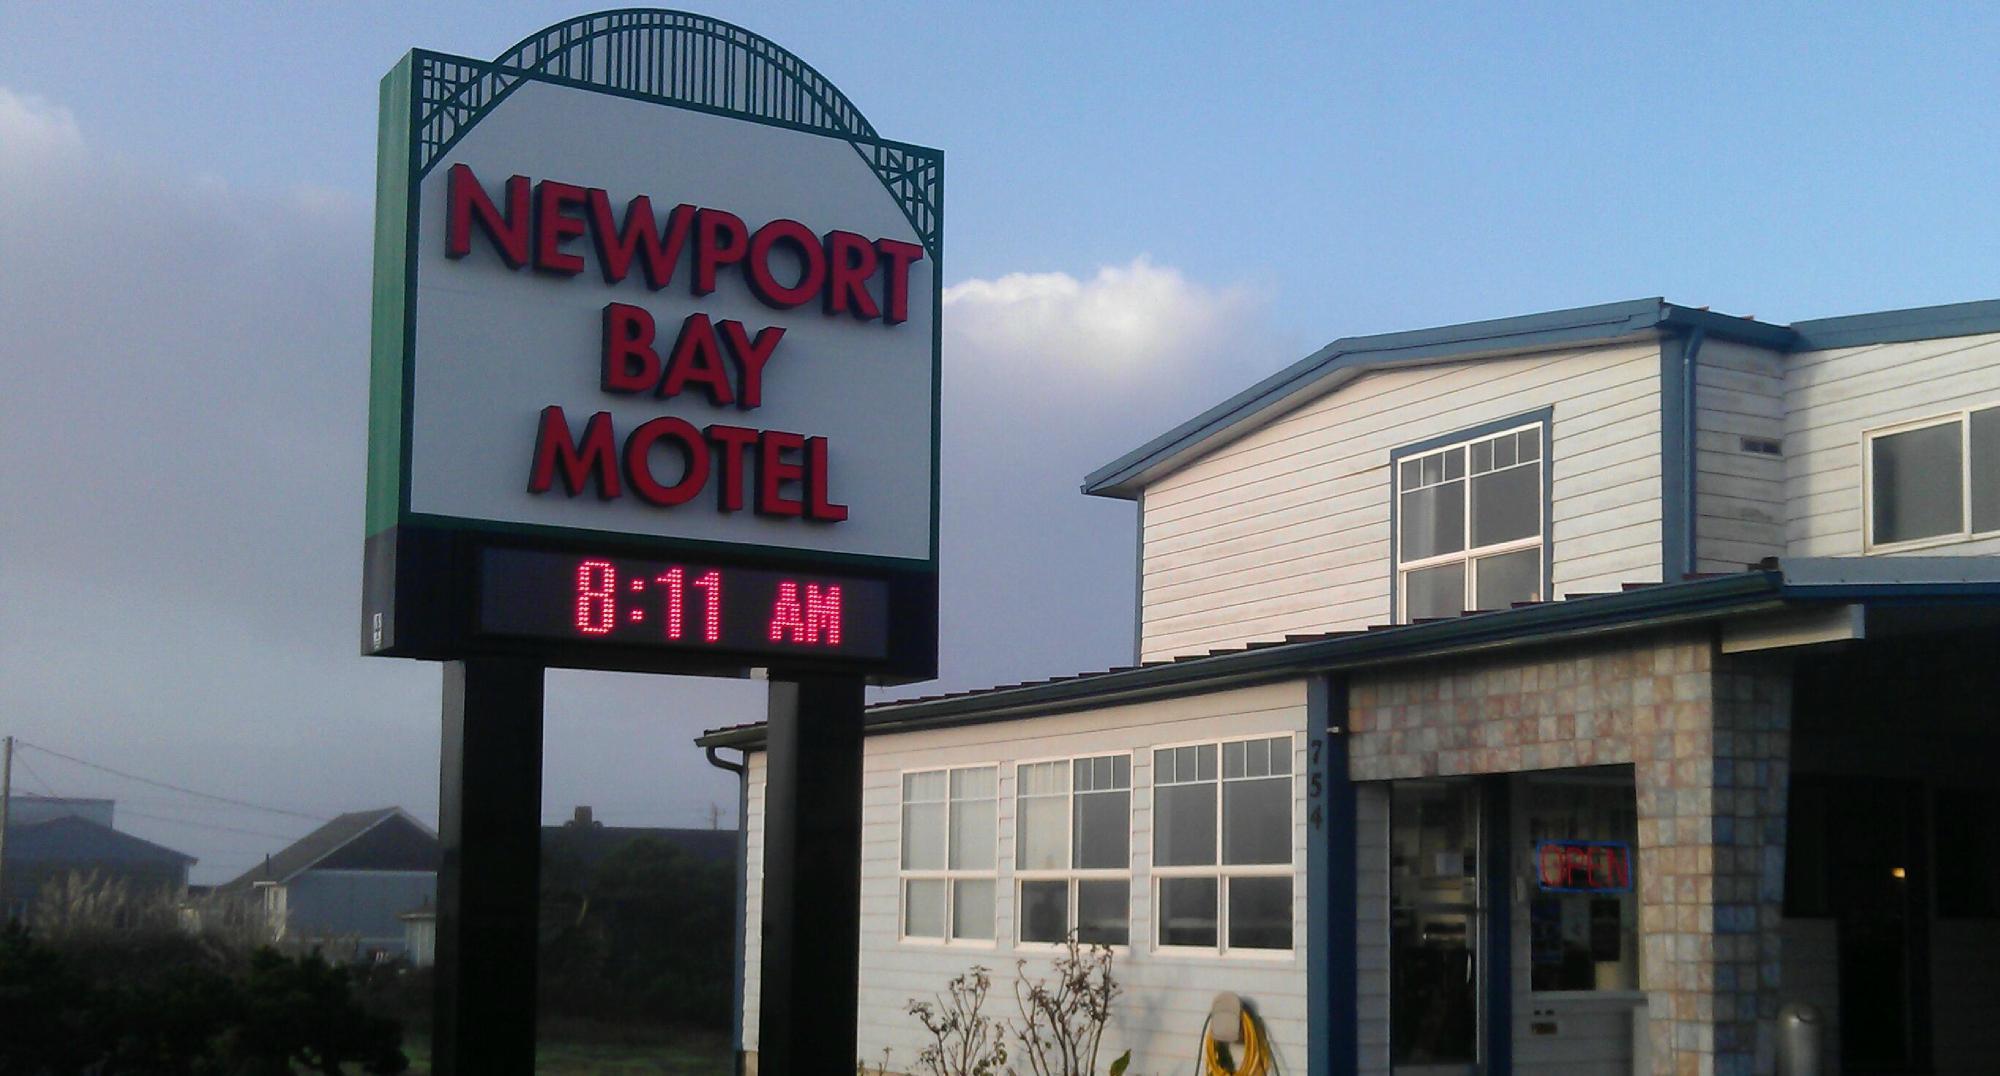 Newport Bay Motel